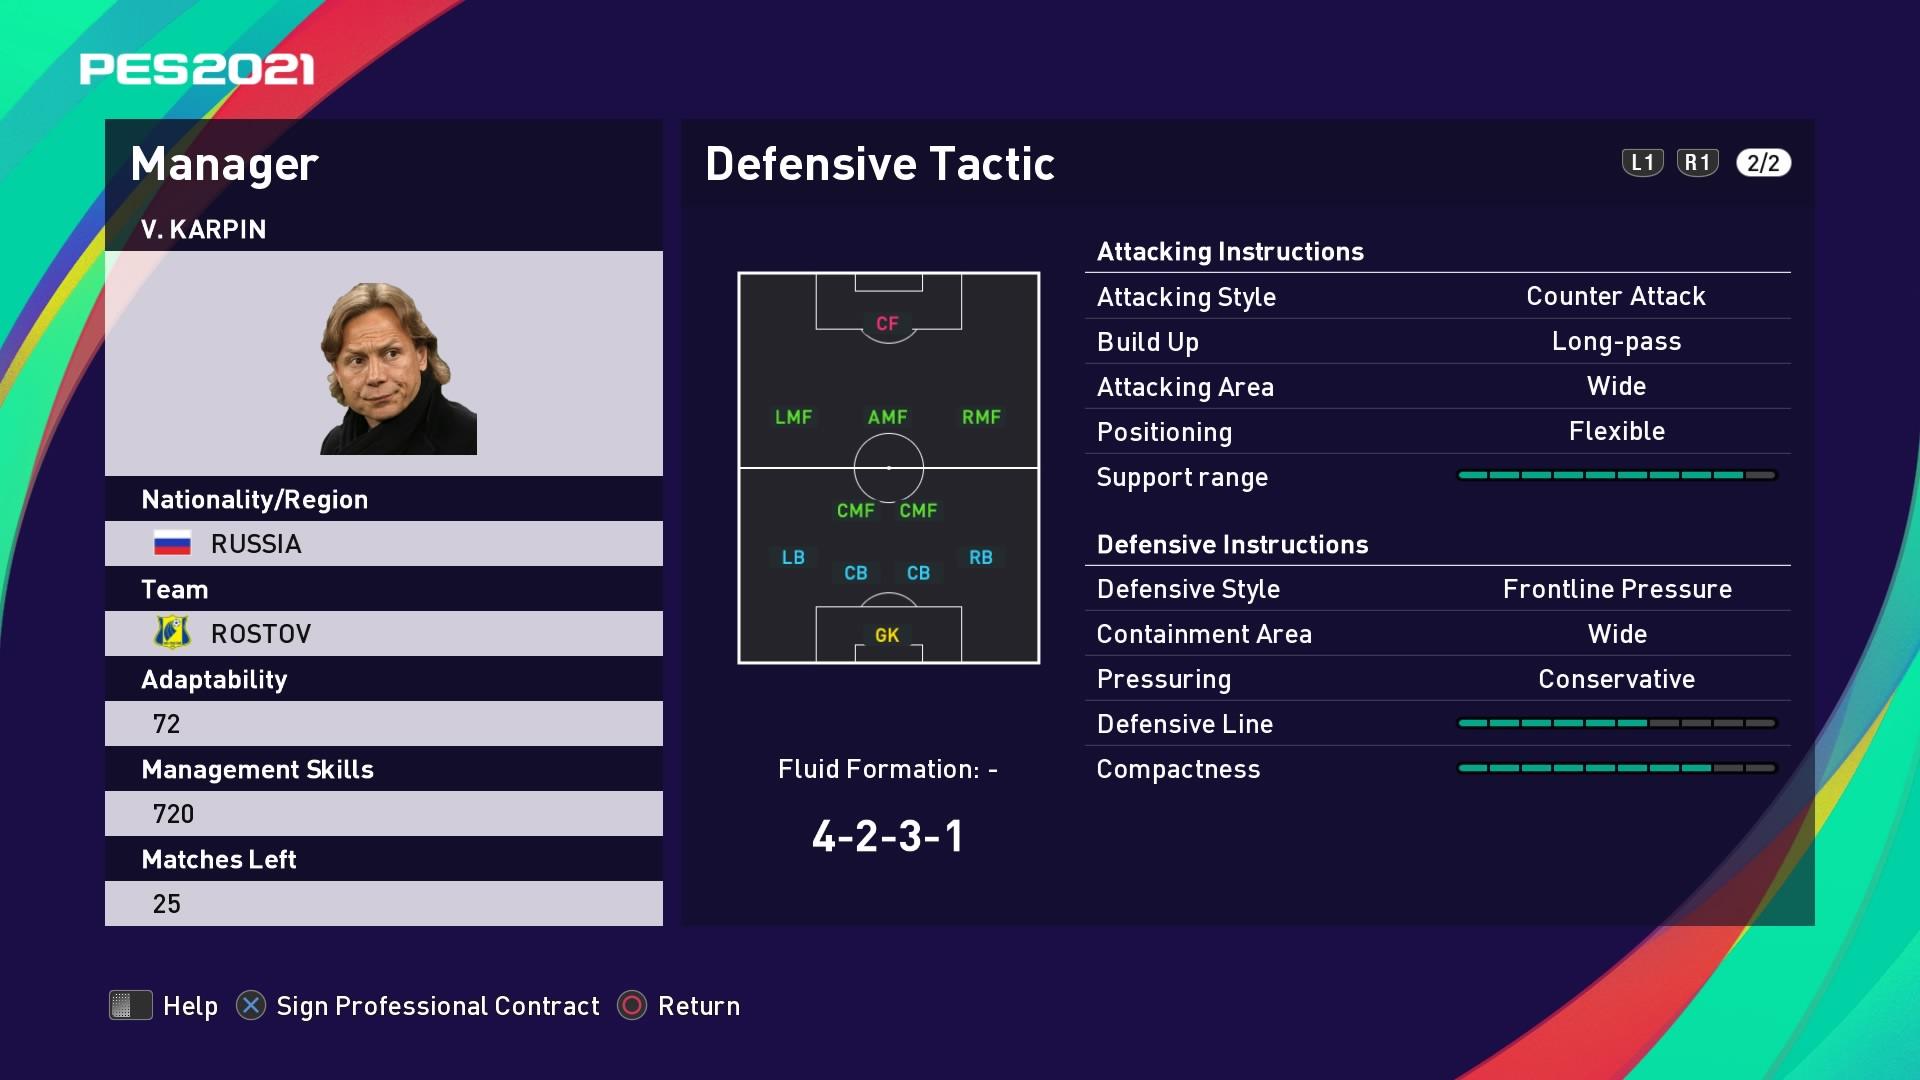 V. Karpin (Valeri Karpin) Defensive Tactic in PES 2021 myClub